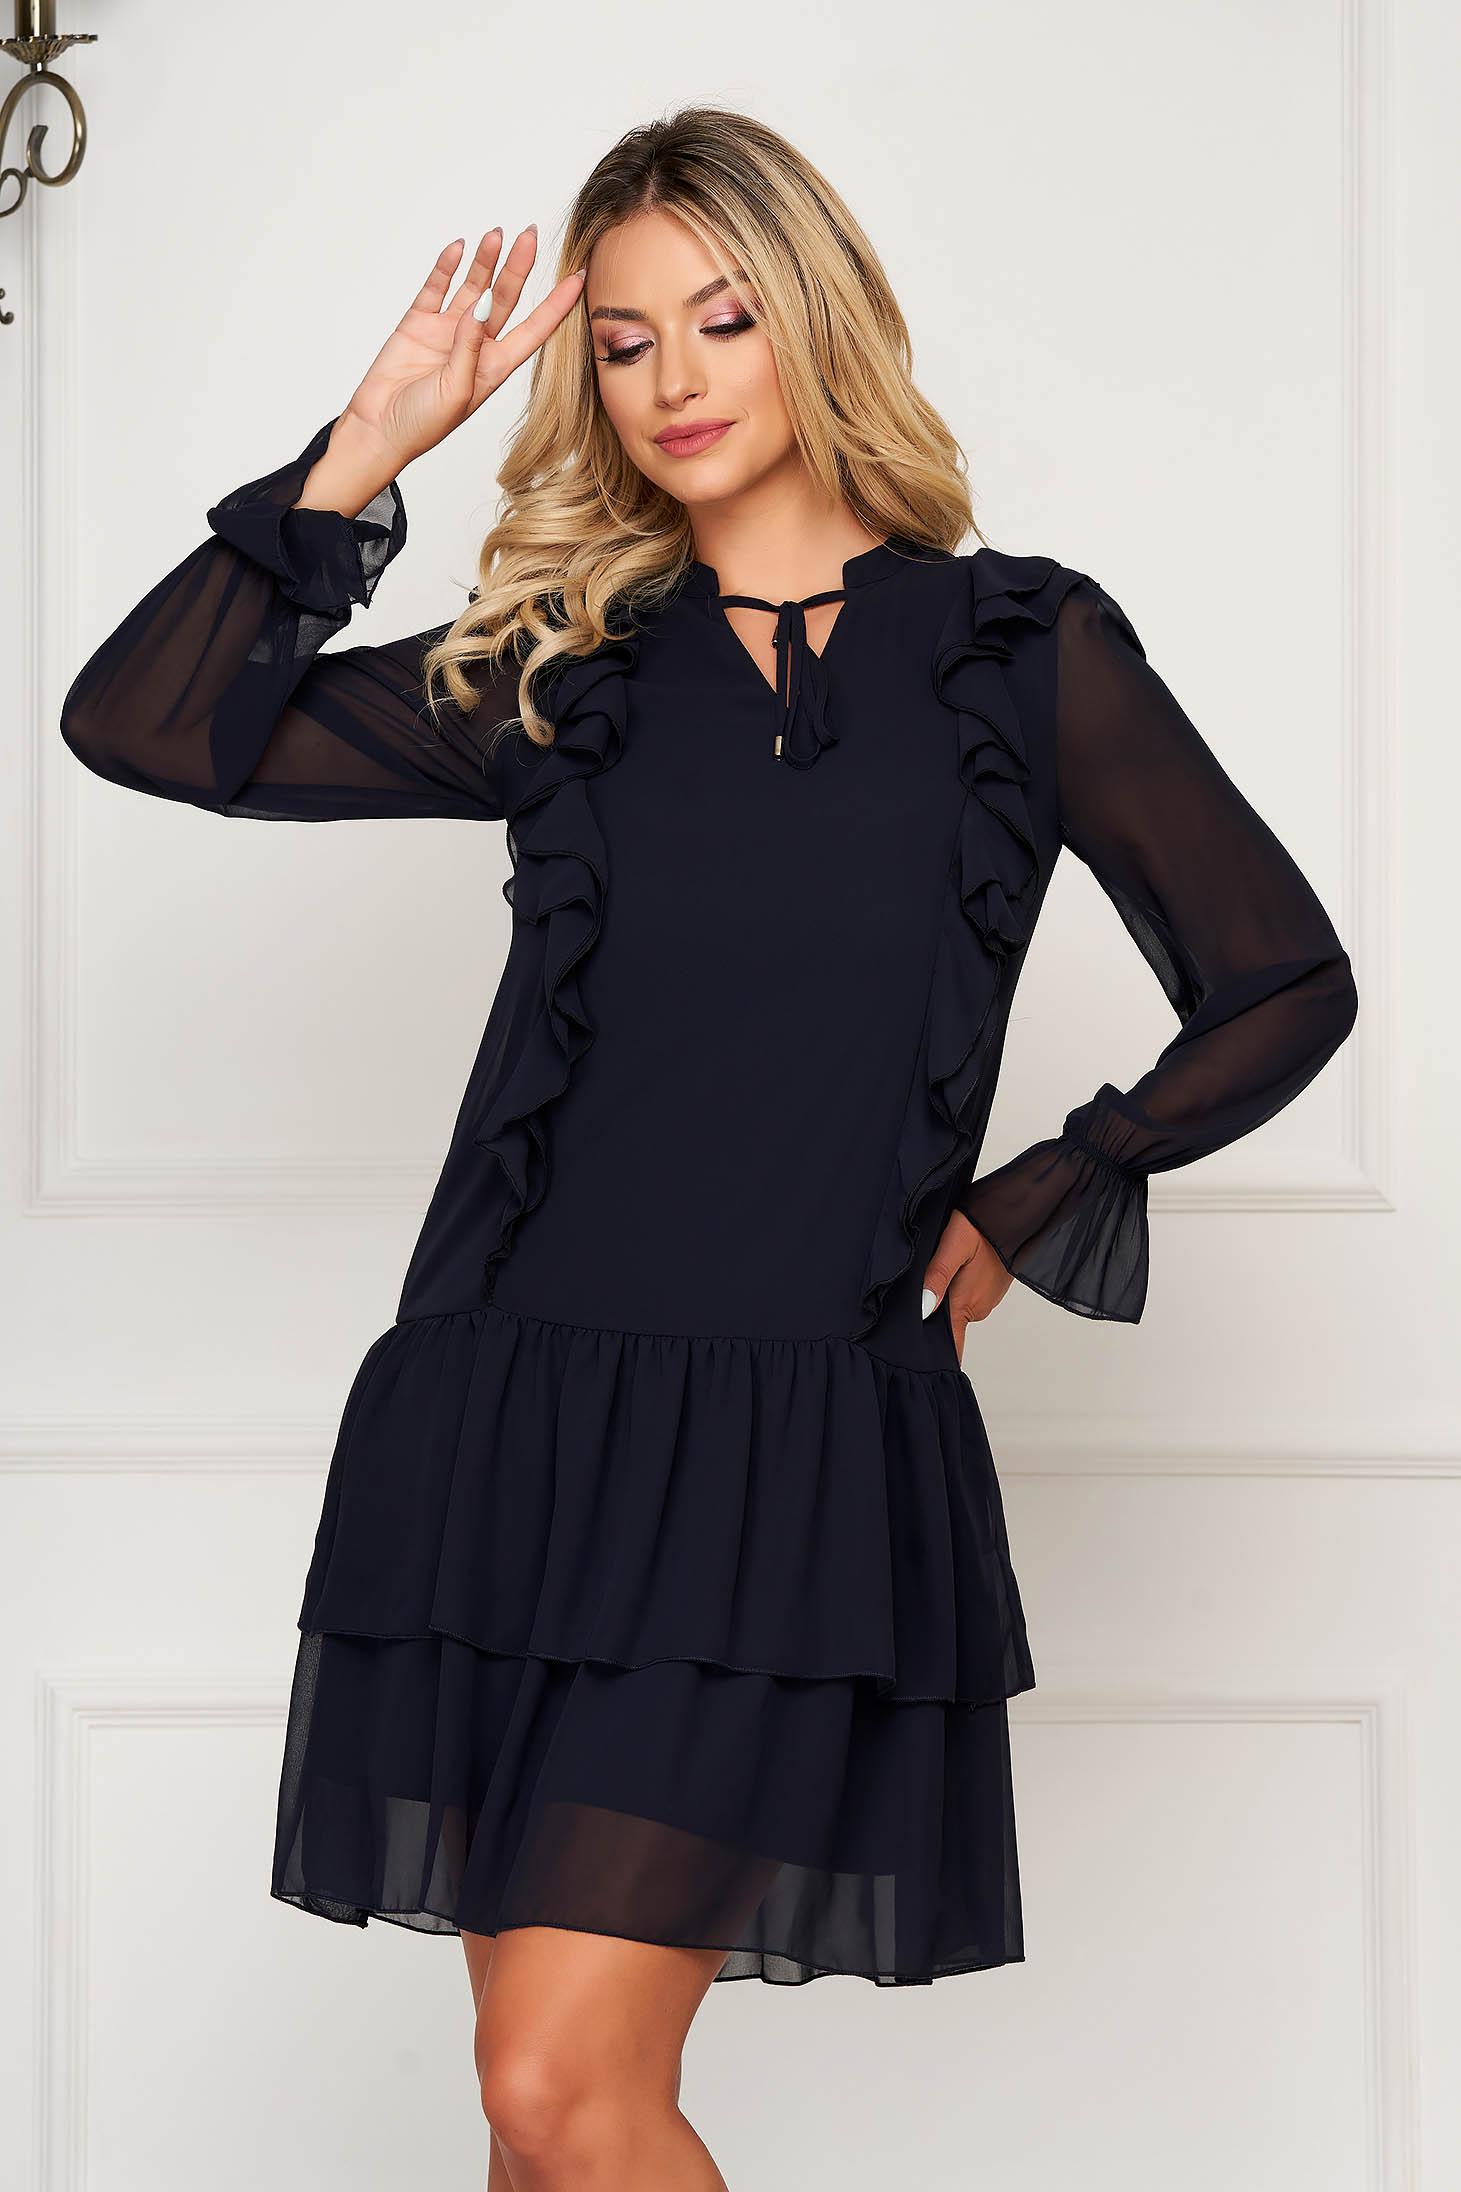 Darkblue dress short cut daily cloche from veil fabric long sleeved